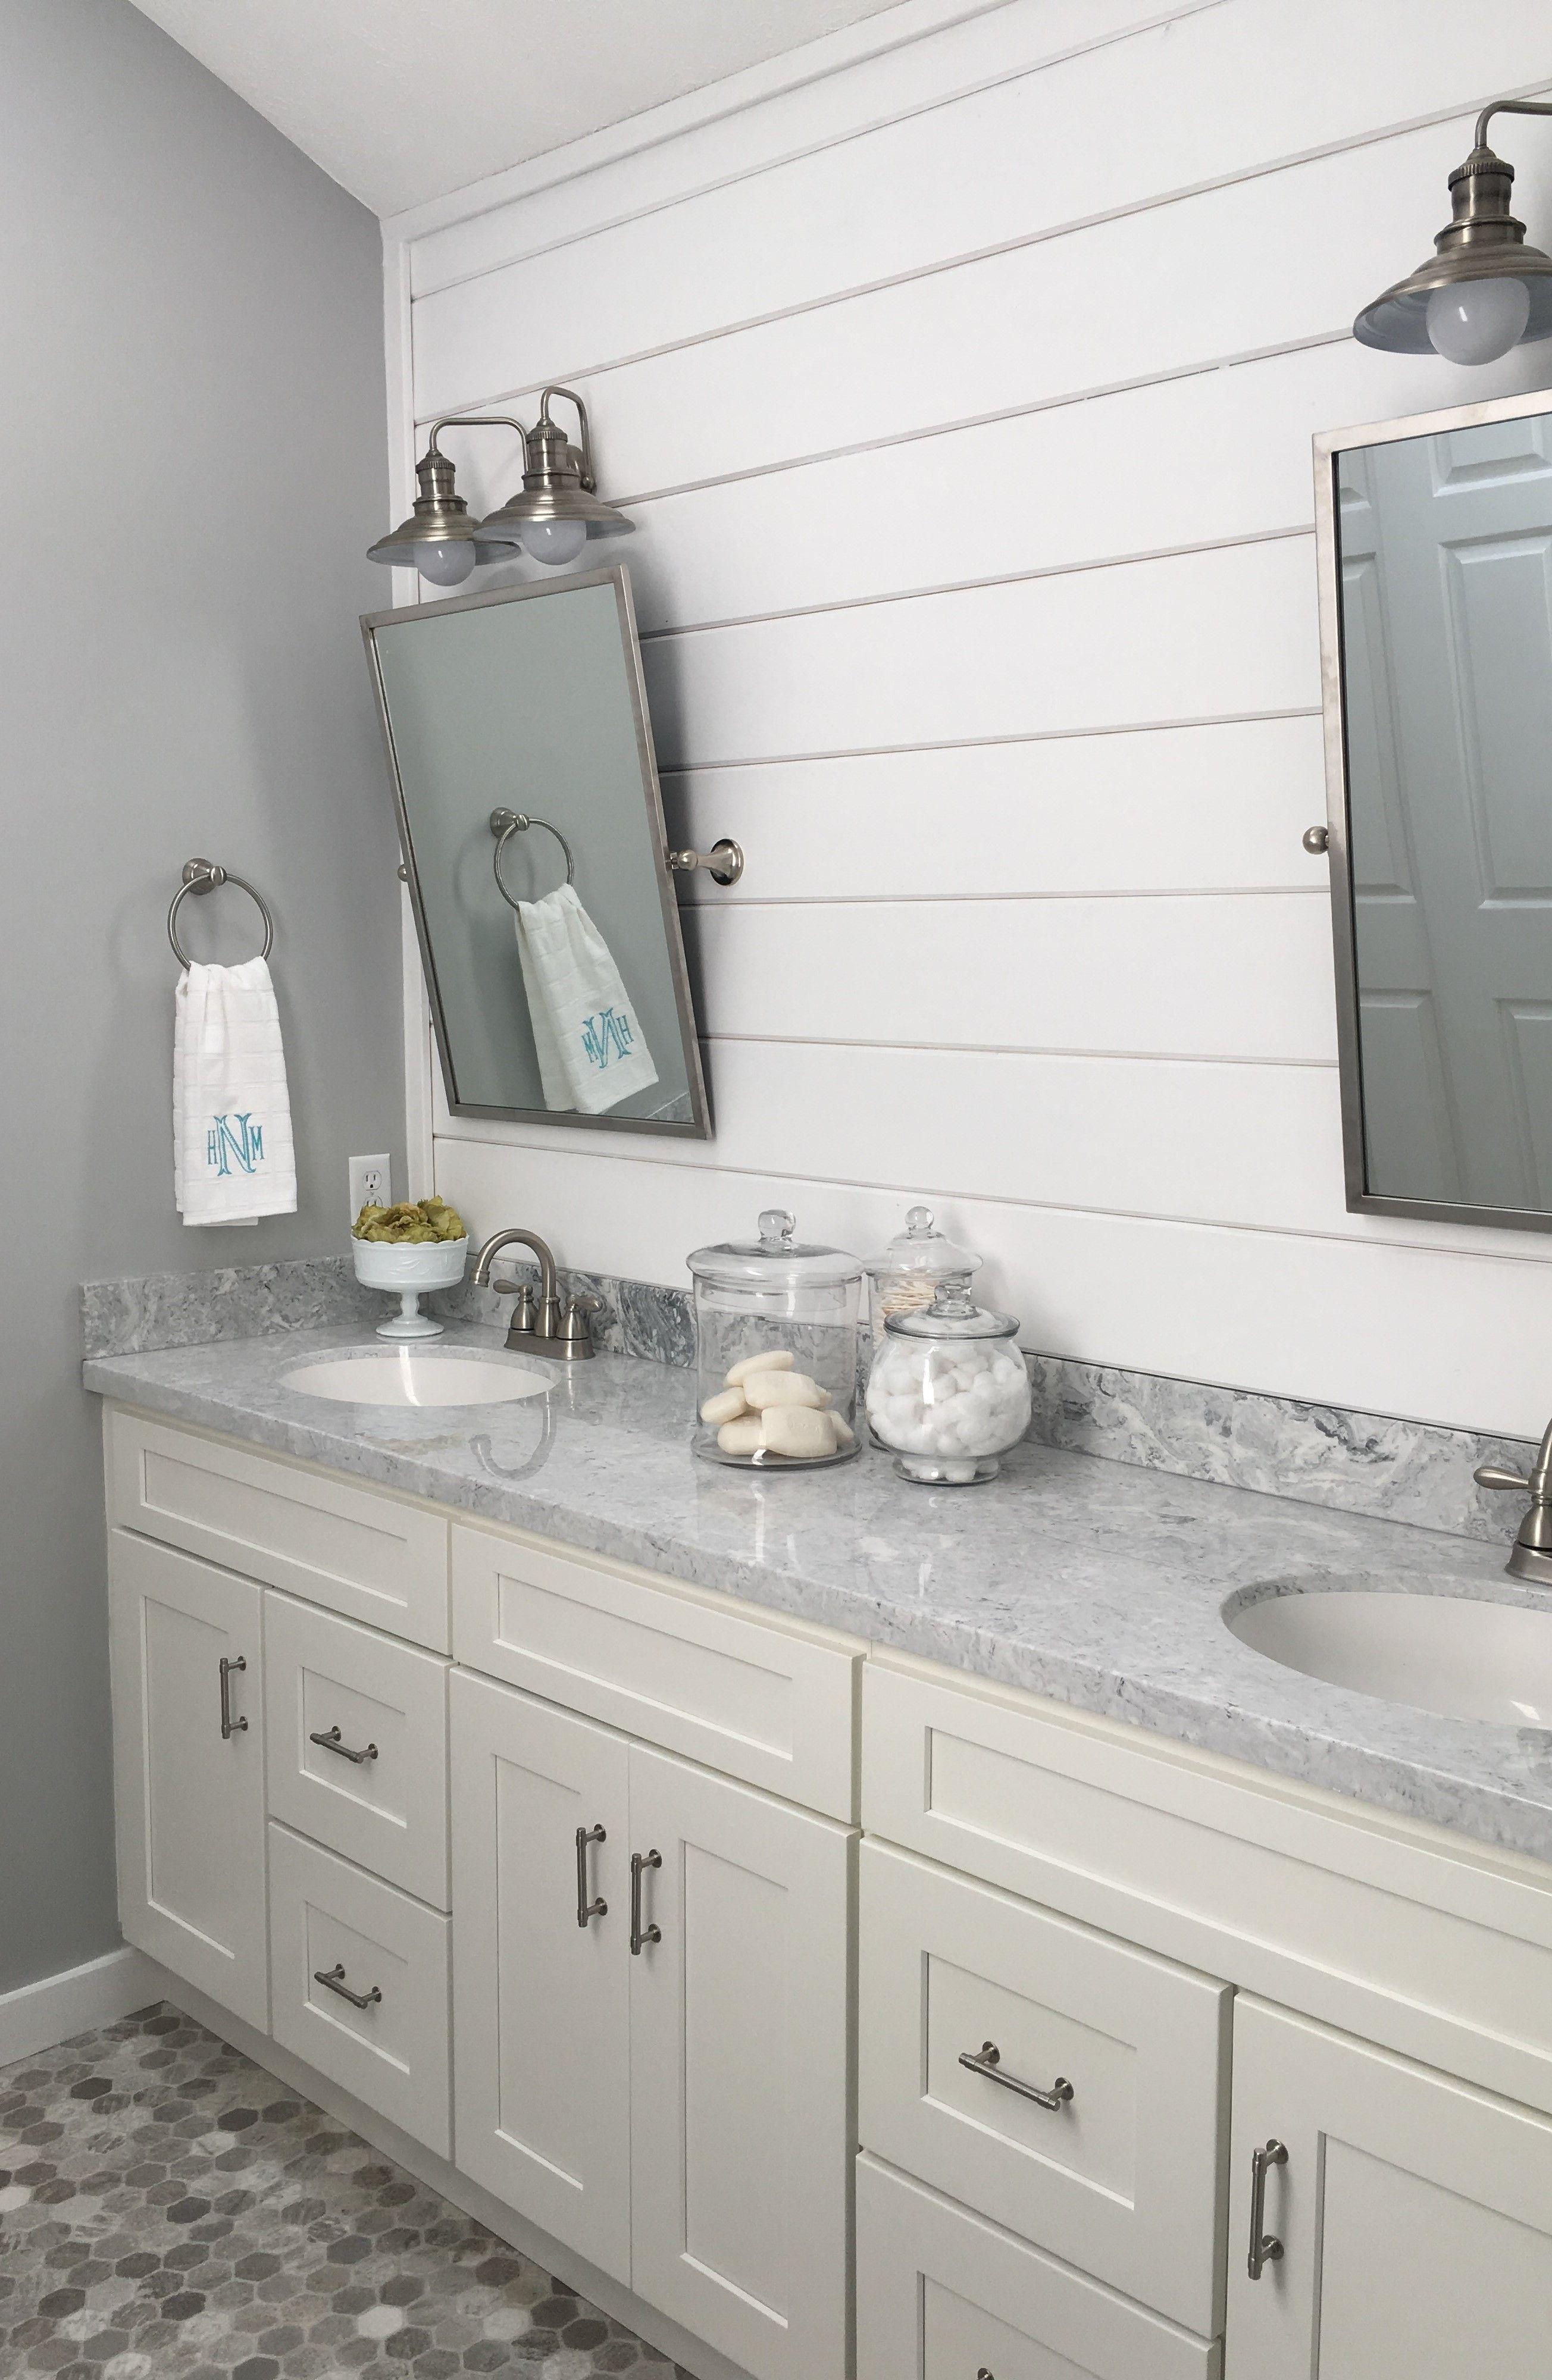 Budget Bathroom Remodel Style master bathroom remodel on a budget | dream bathrooms, farmhouse